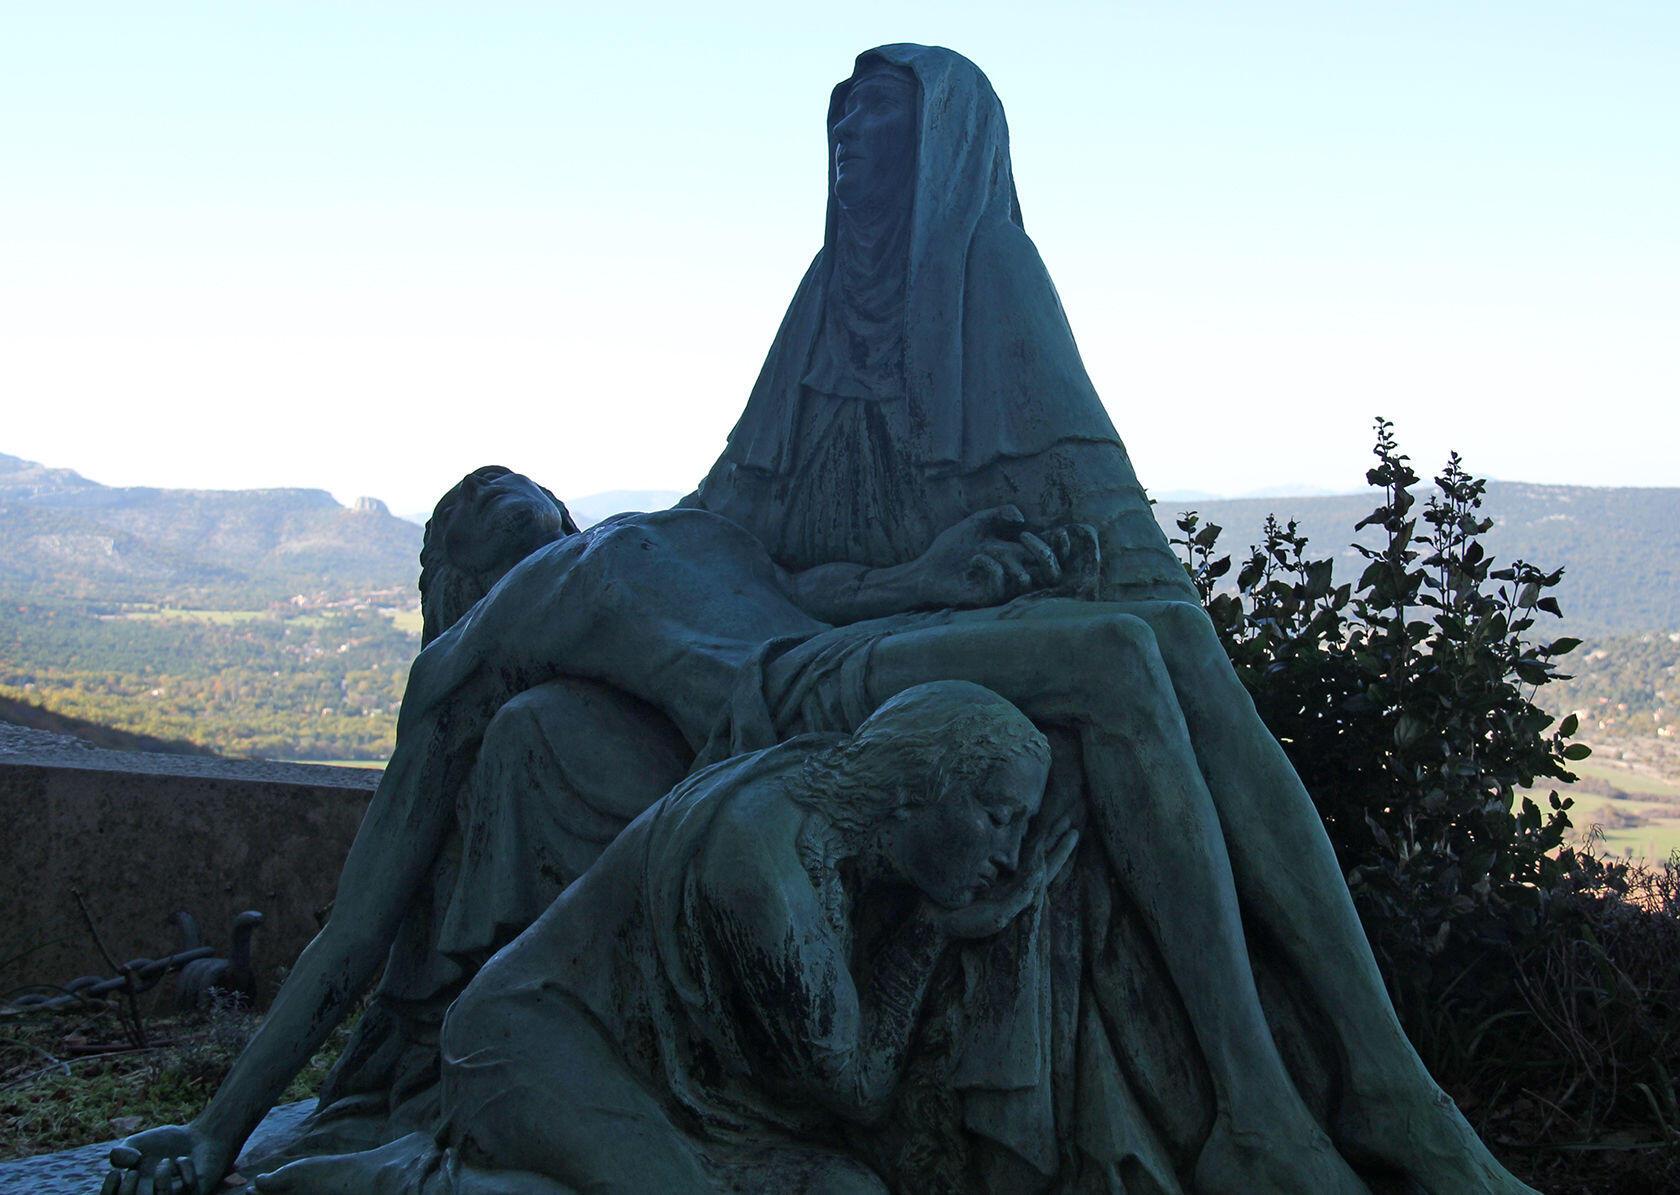 Sainte Baume Grotto Mary Magdalene Statue